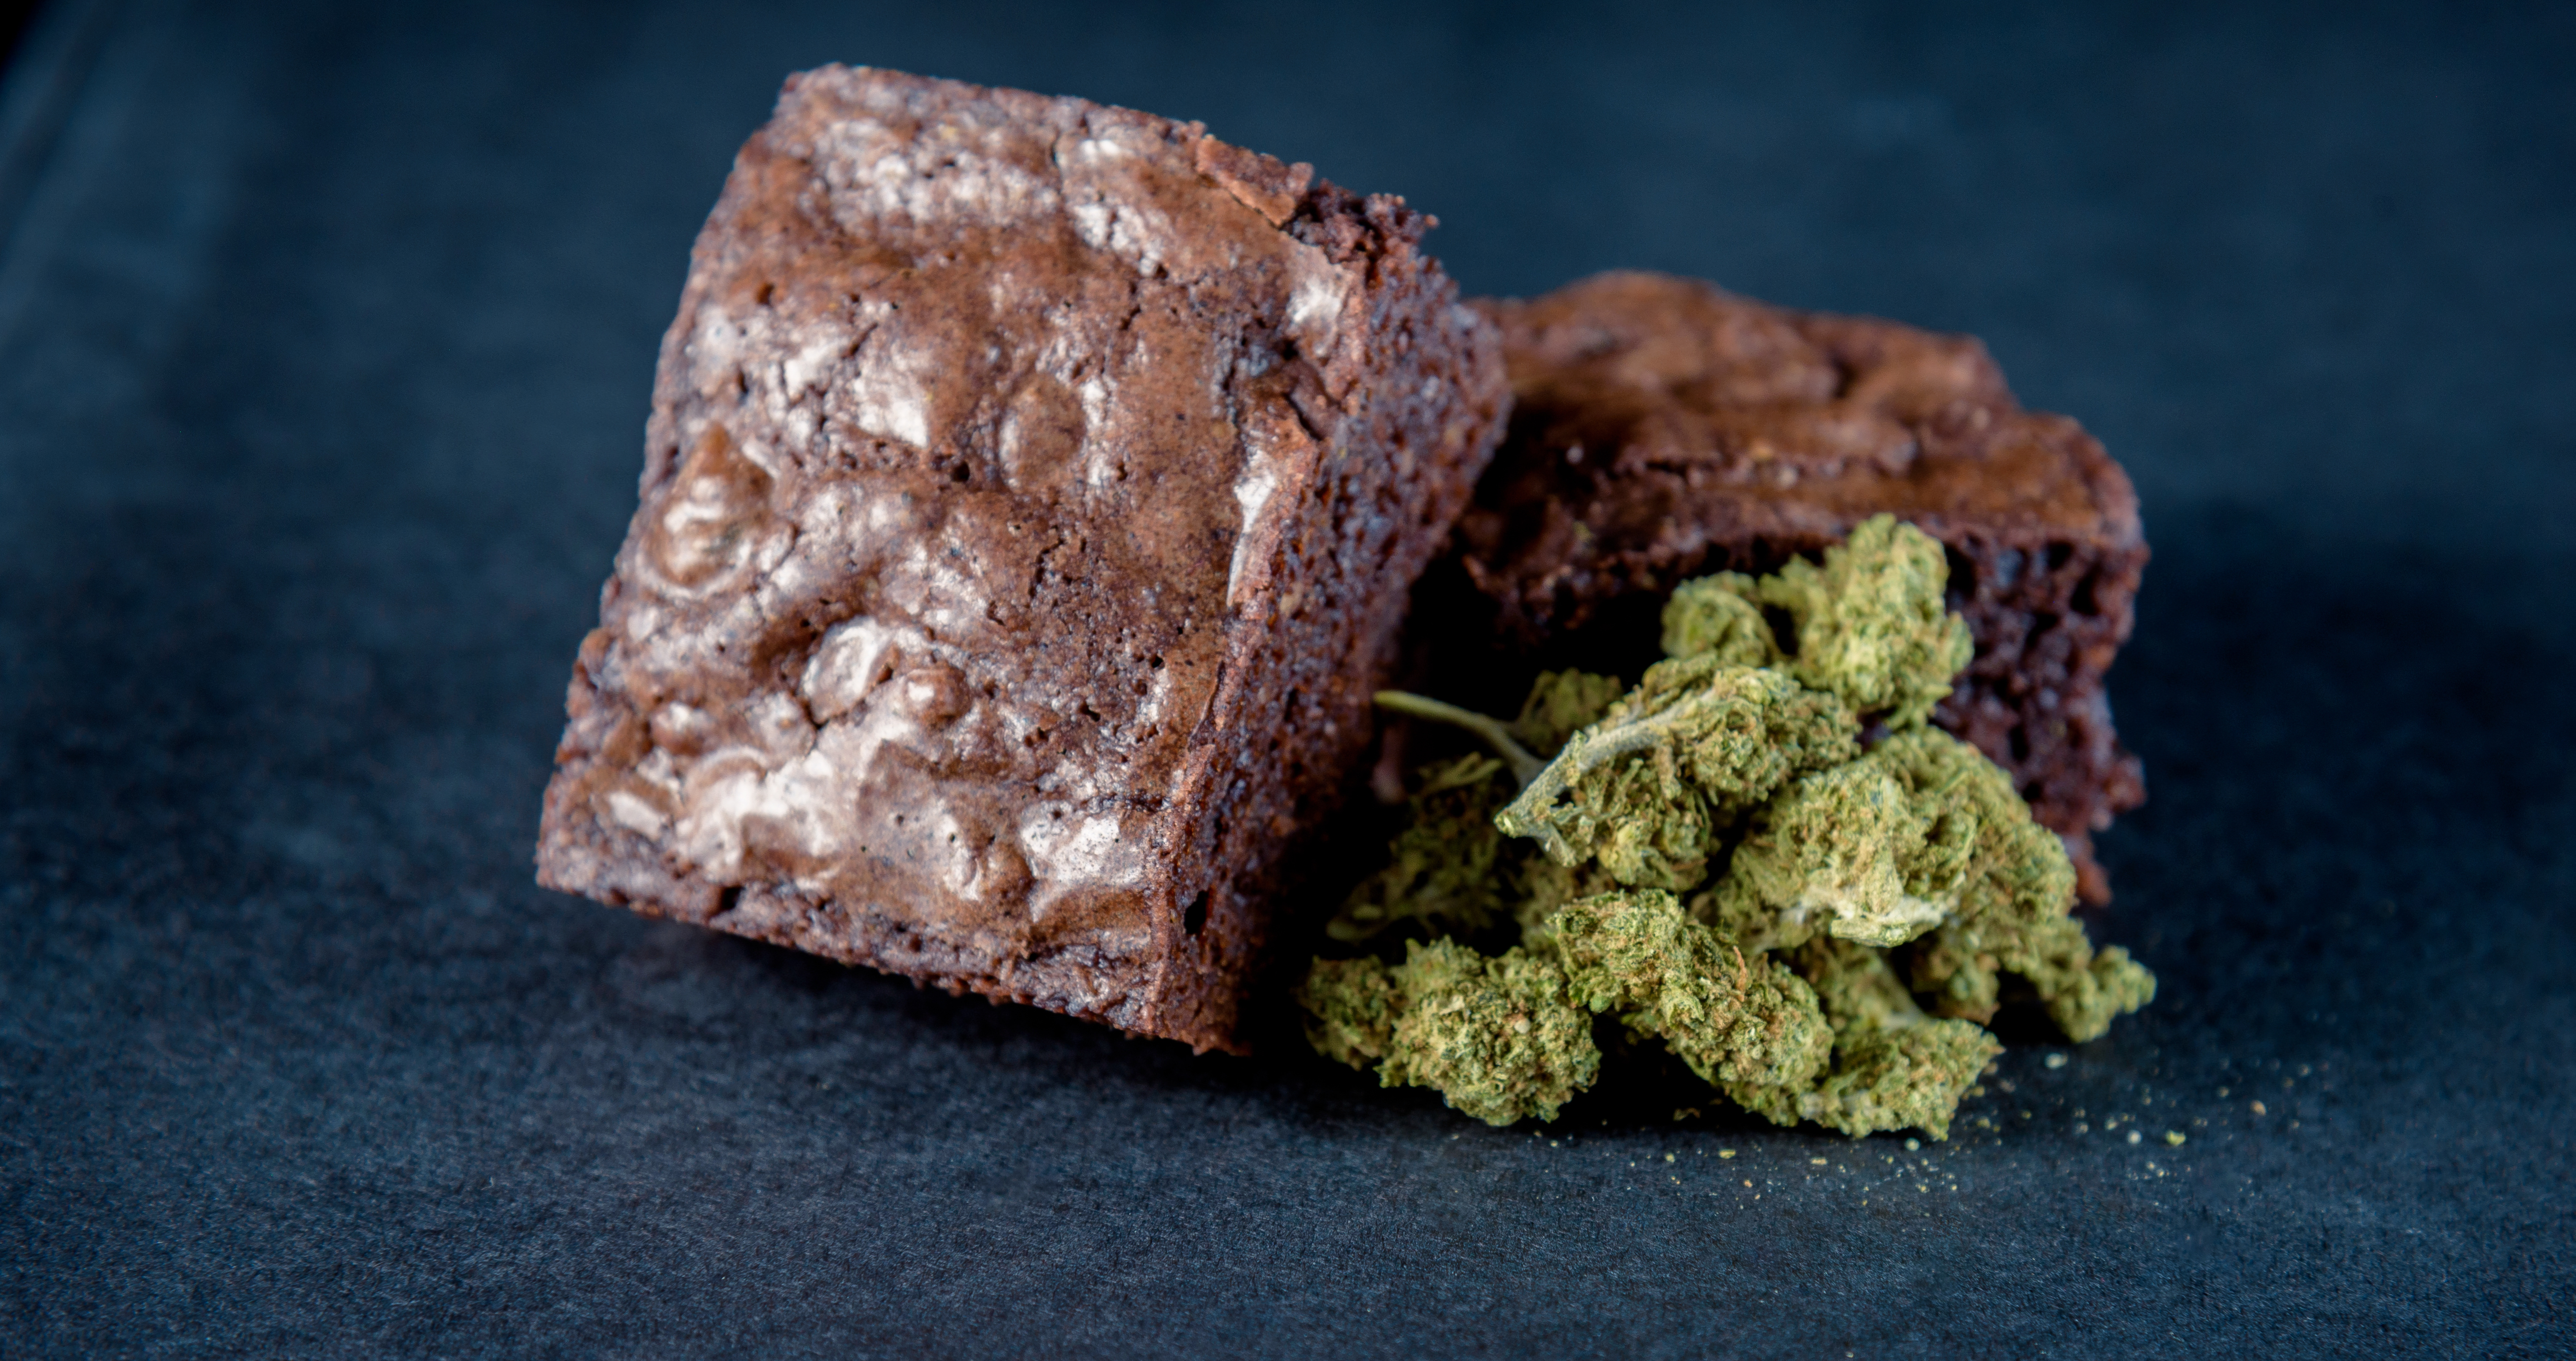 Muddy waters ahead for Cannabis edibles, according to Dalhousie University professor